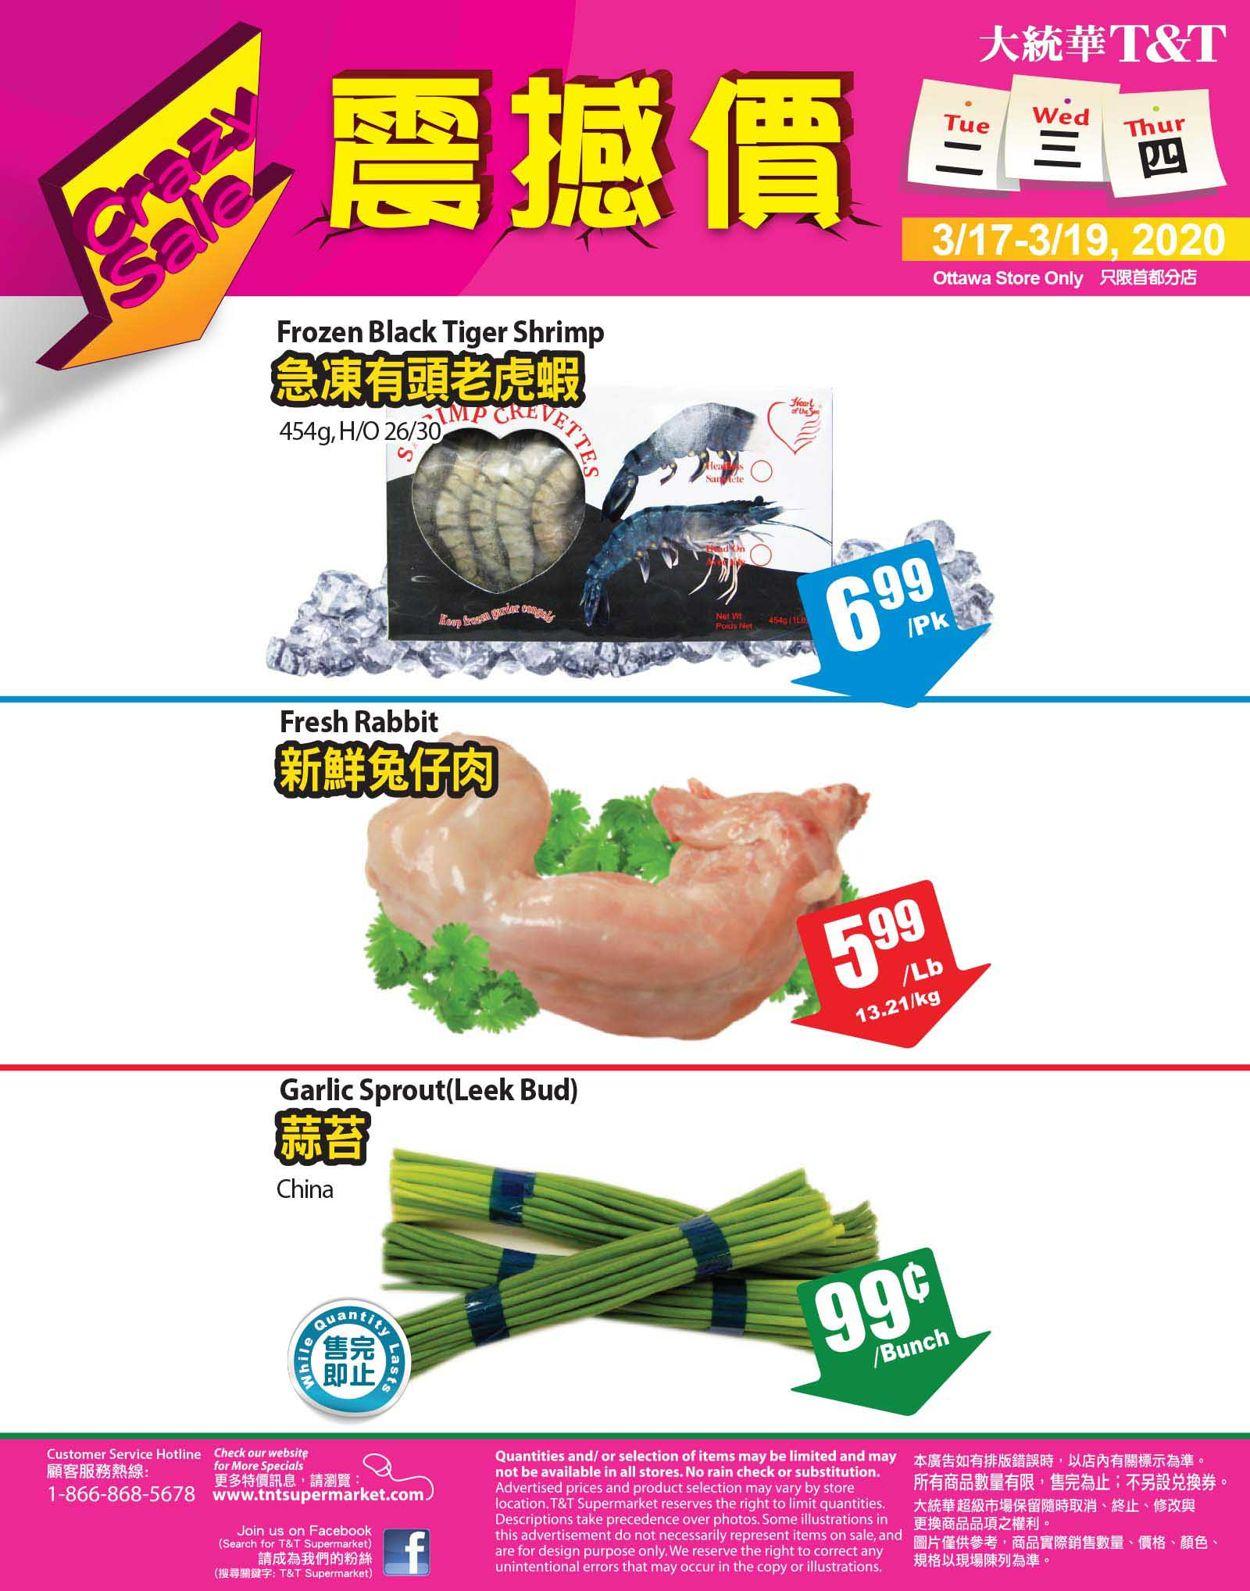 T&T Supermarket Flyer - 03/17-03/19/2020